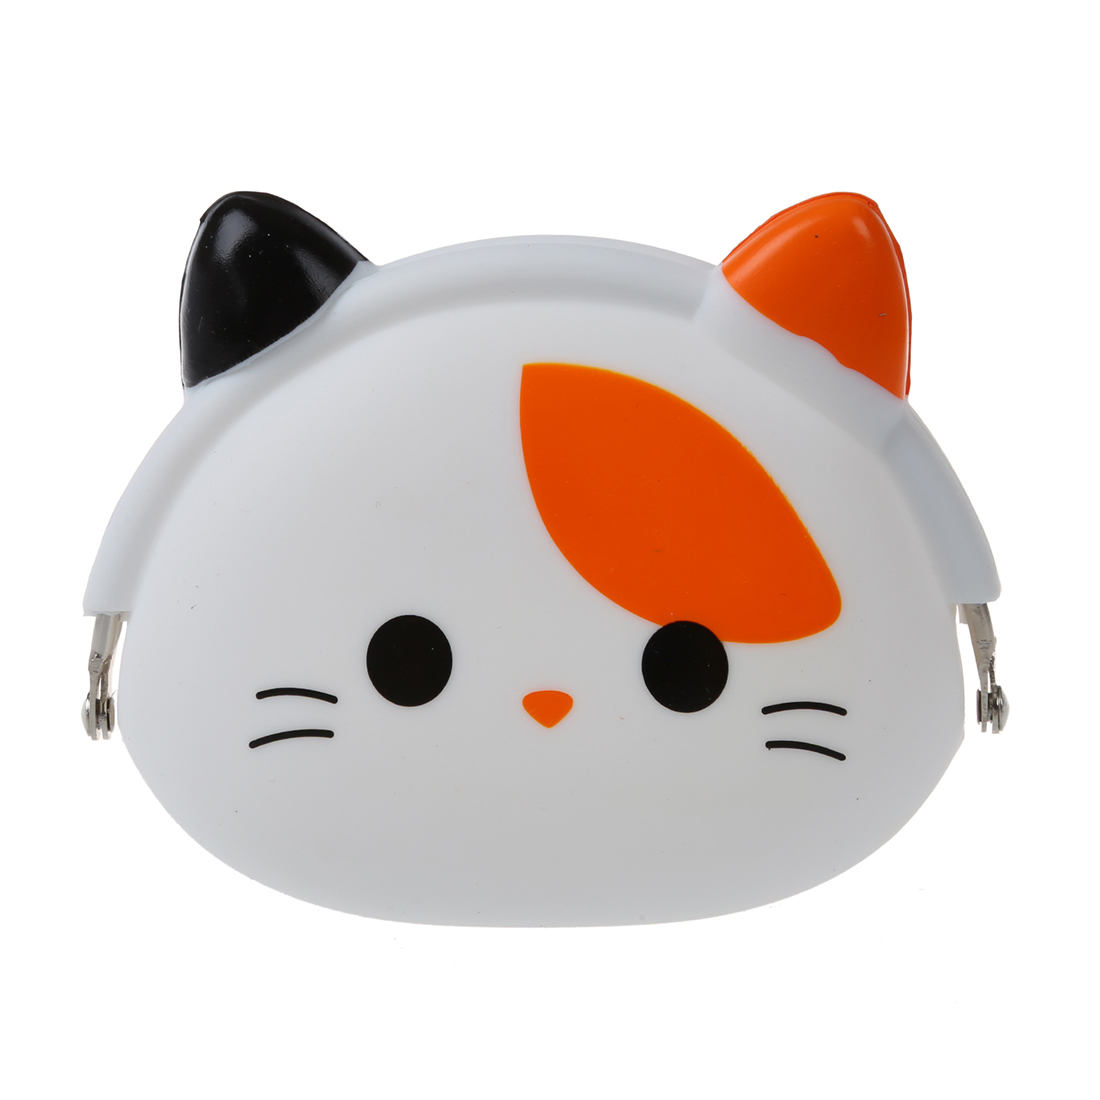 AFBC-Women Girls Wallet Kawaii Cute Cartoon Animal Silicone Jelly Coin Bag Purse Kids Gift Small Cat